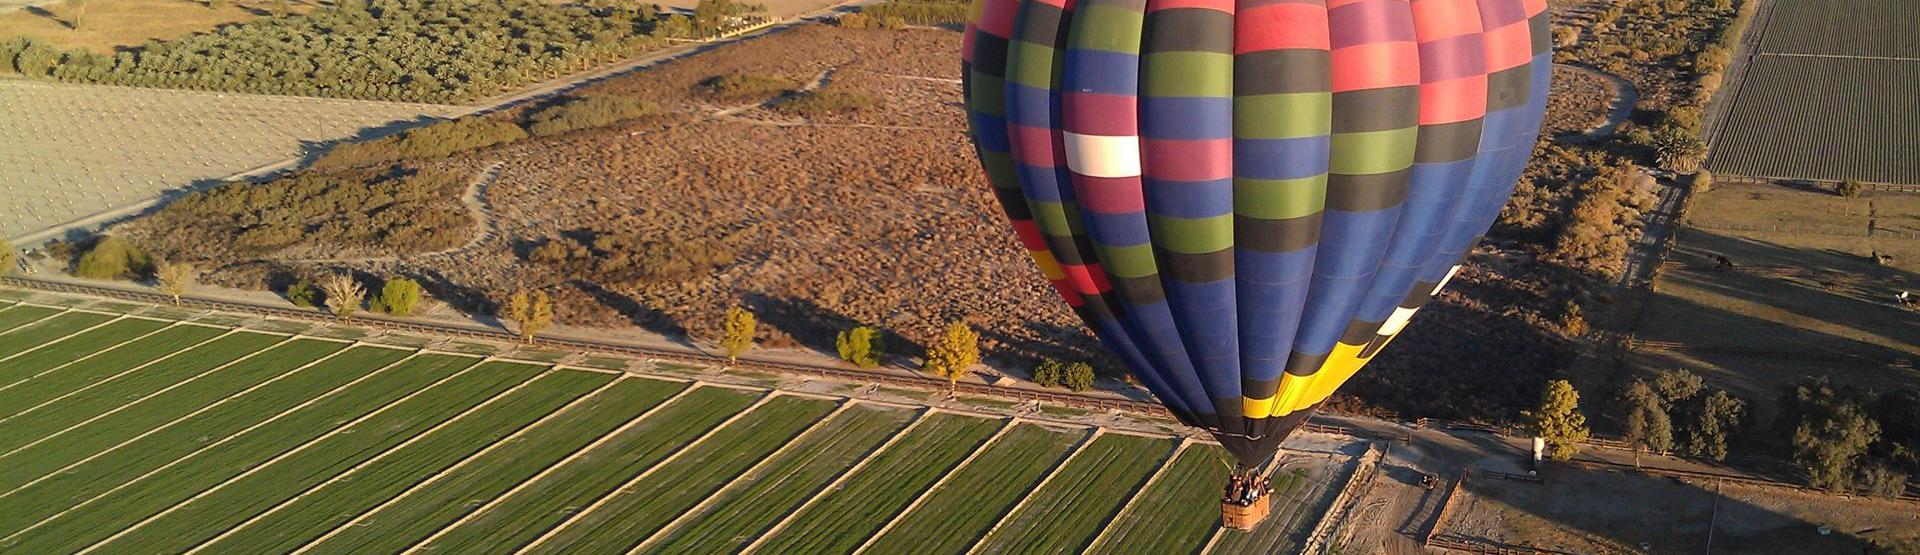 aerial_hotair_ballooning_1920x611__hero.jpg